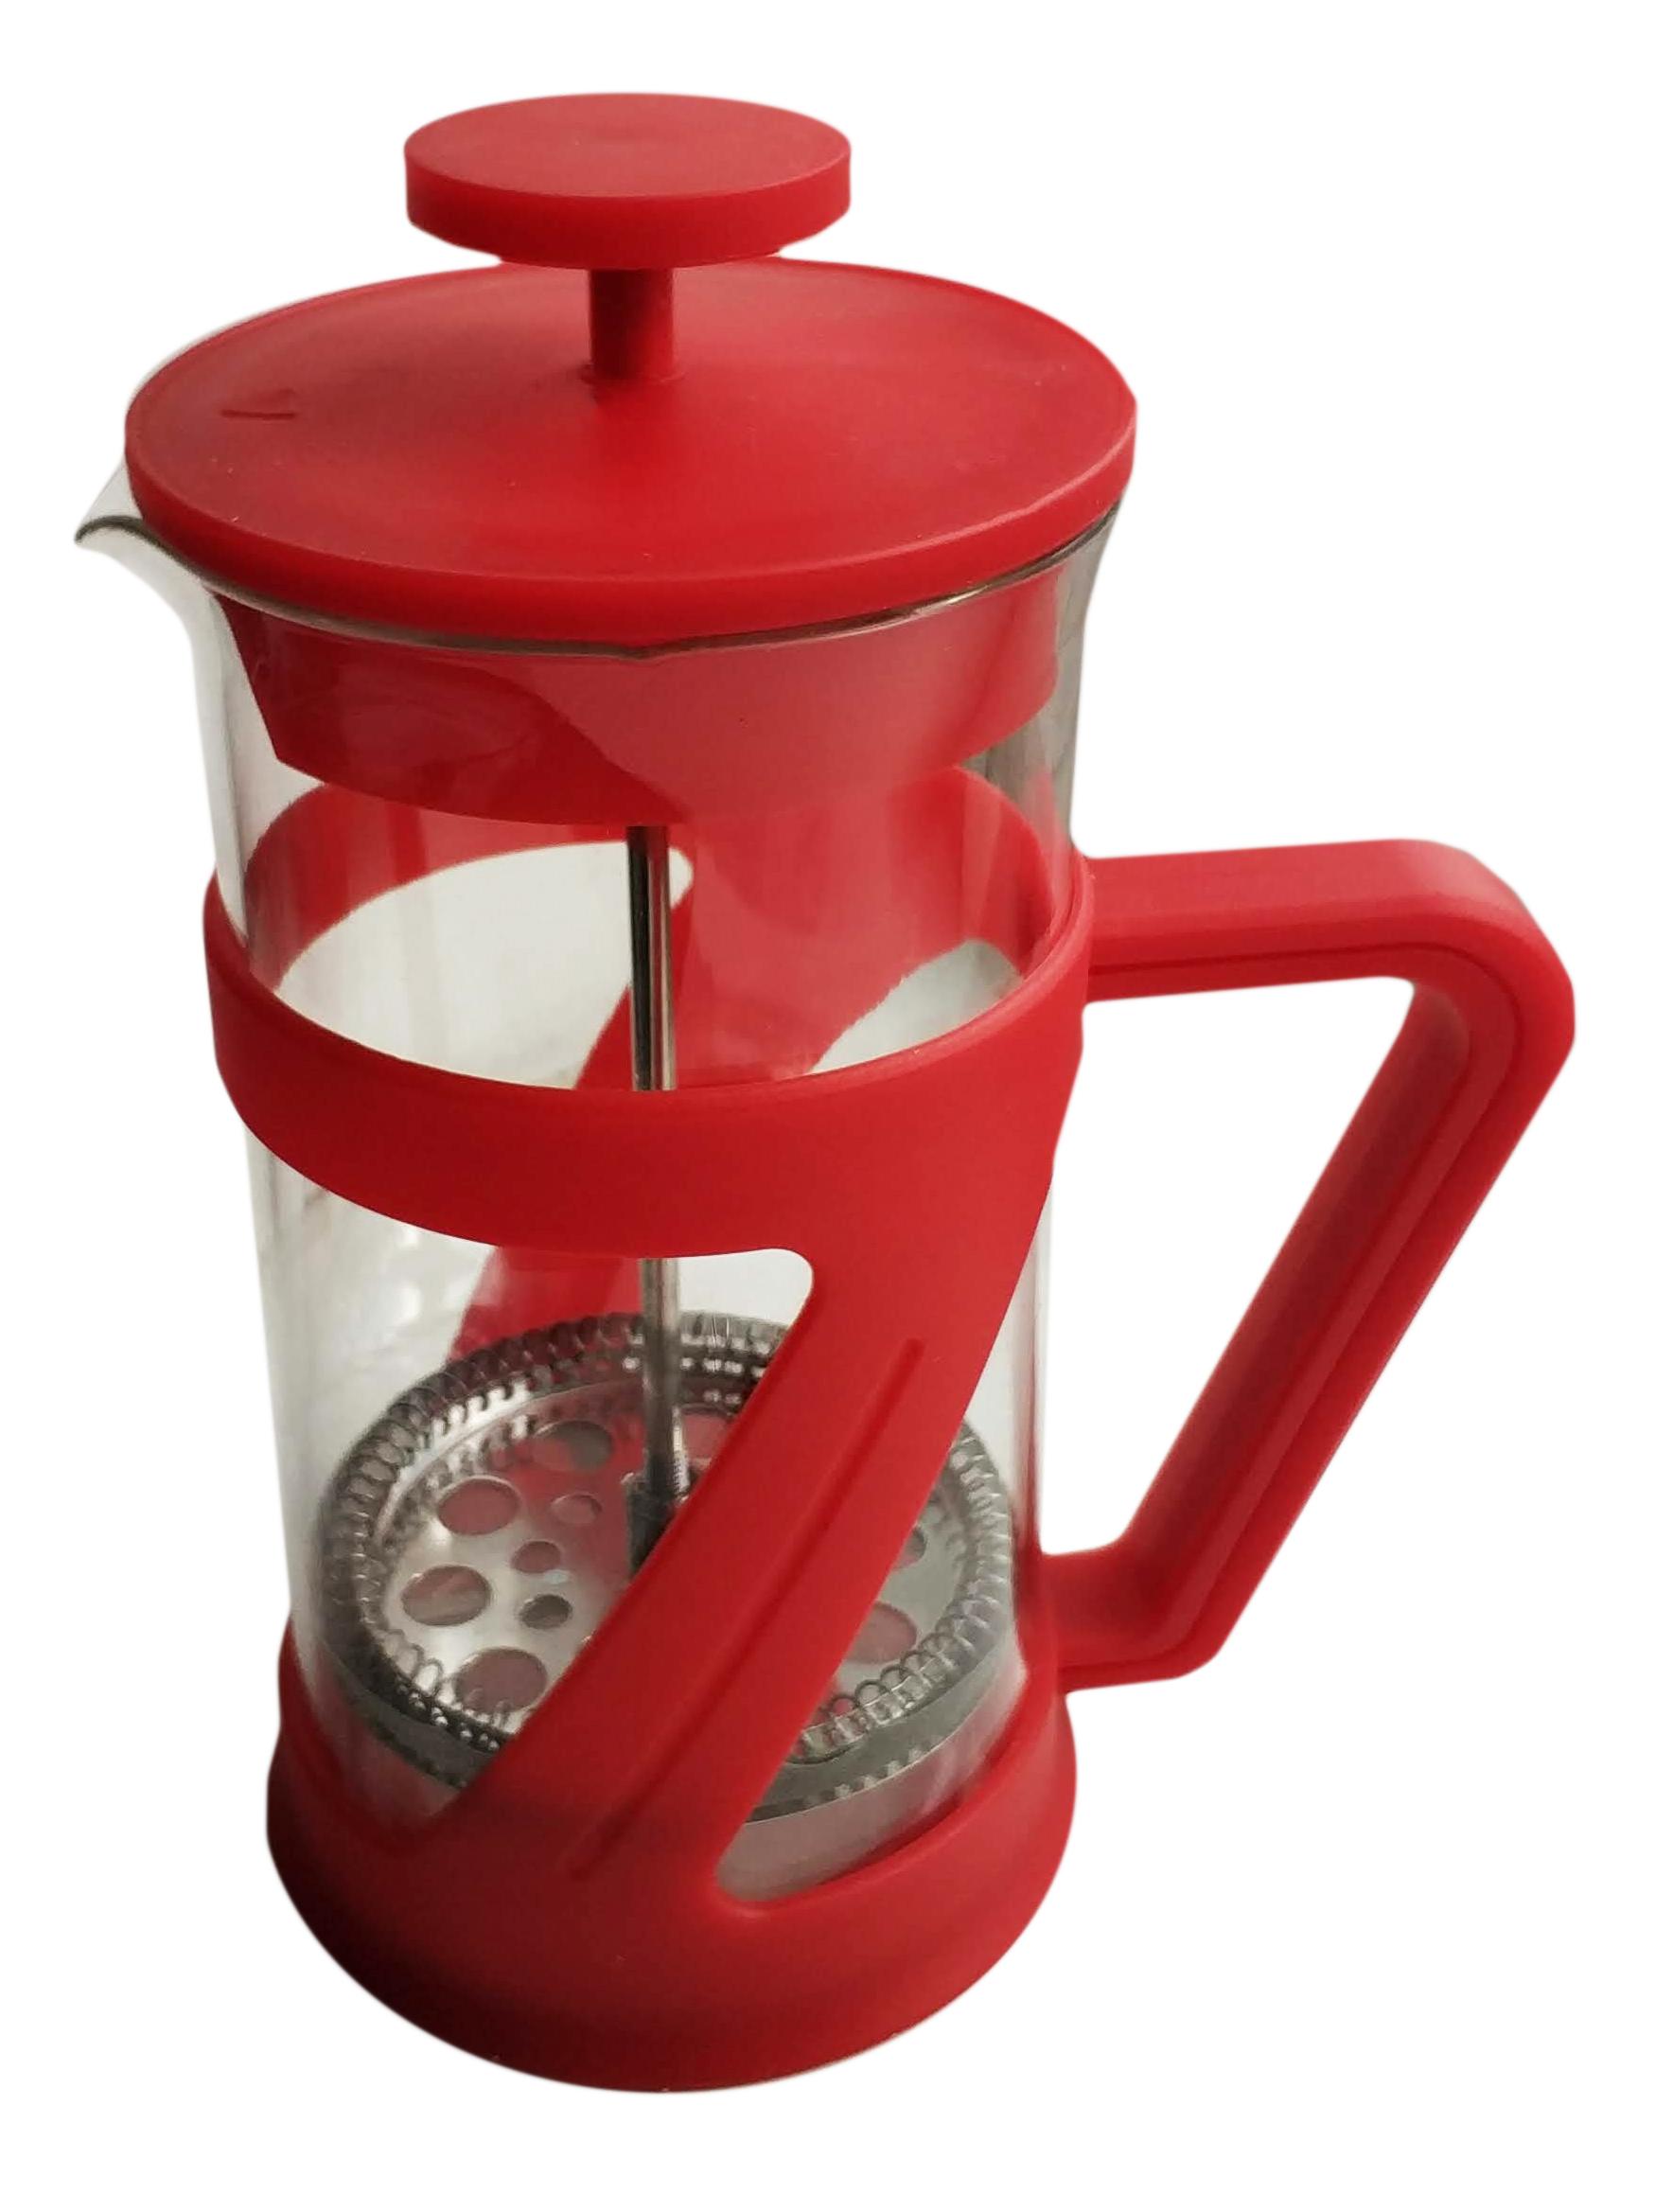 Френч-пресс Kaffee-/Teebereiter 600 мл красный